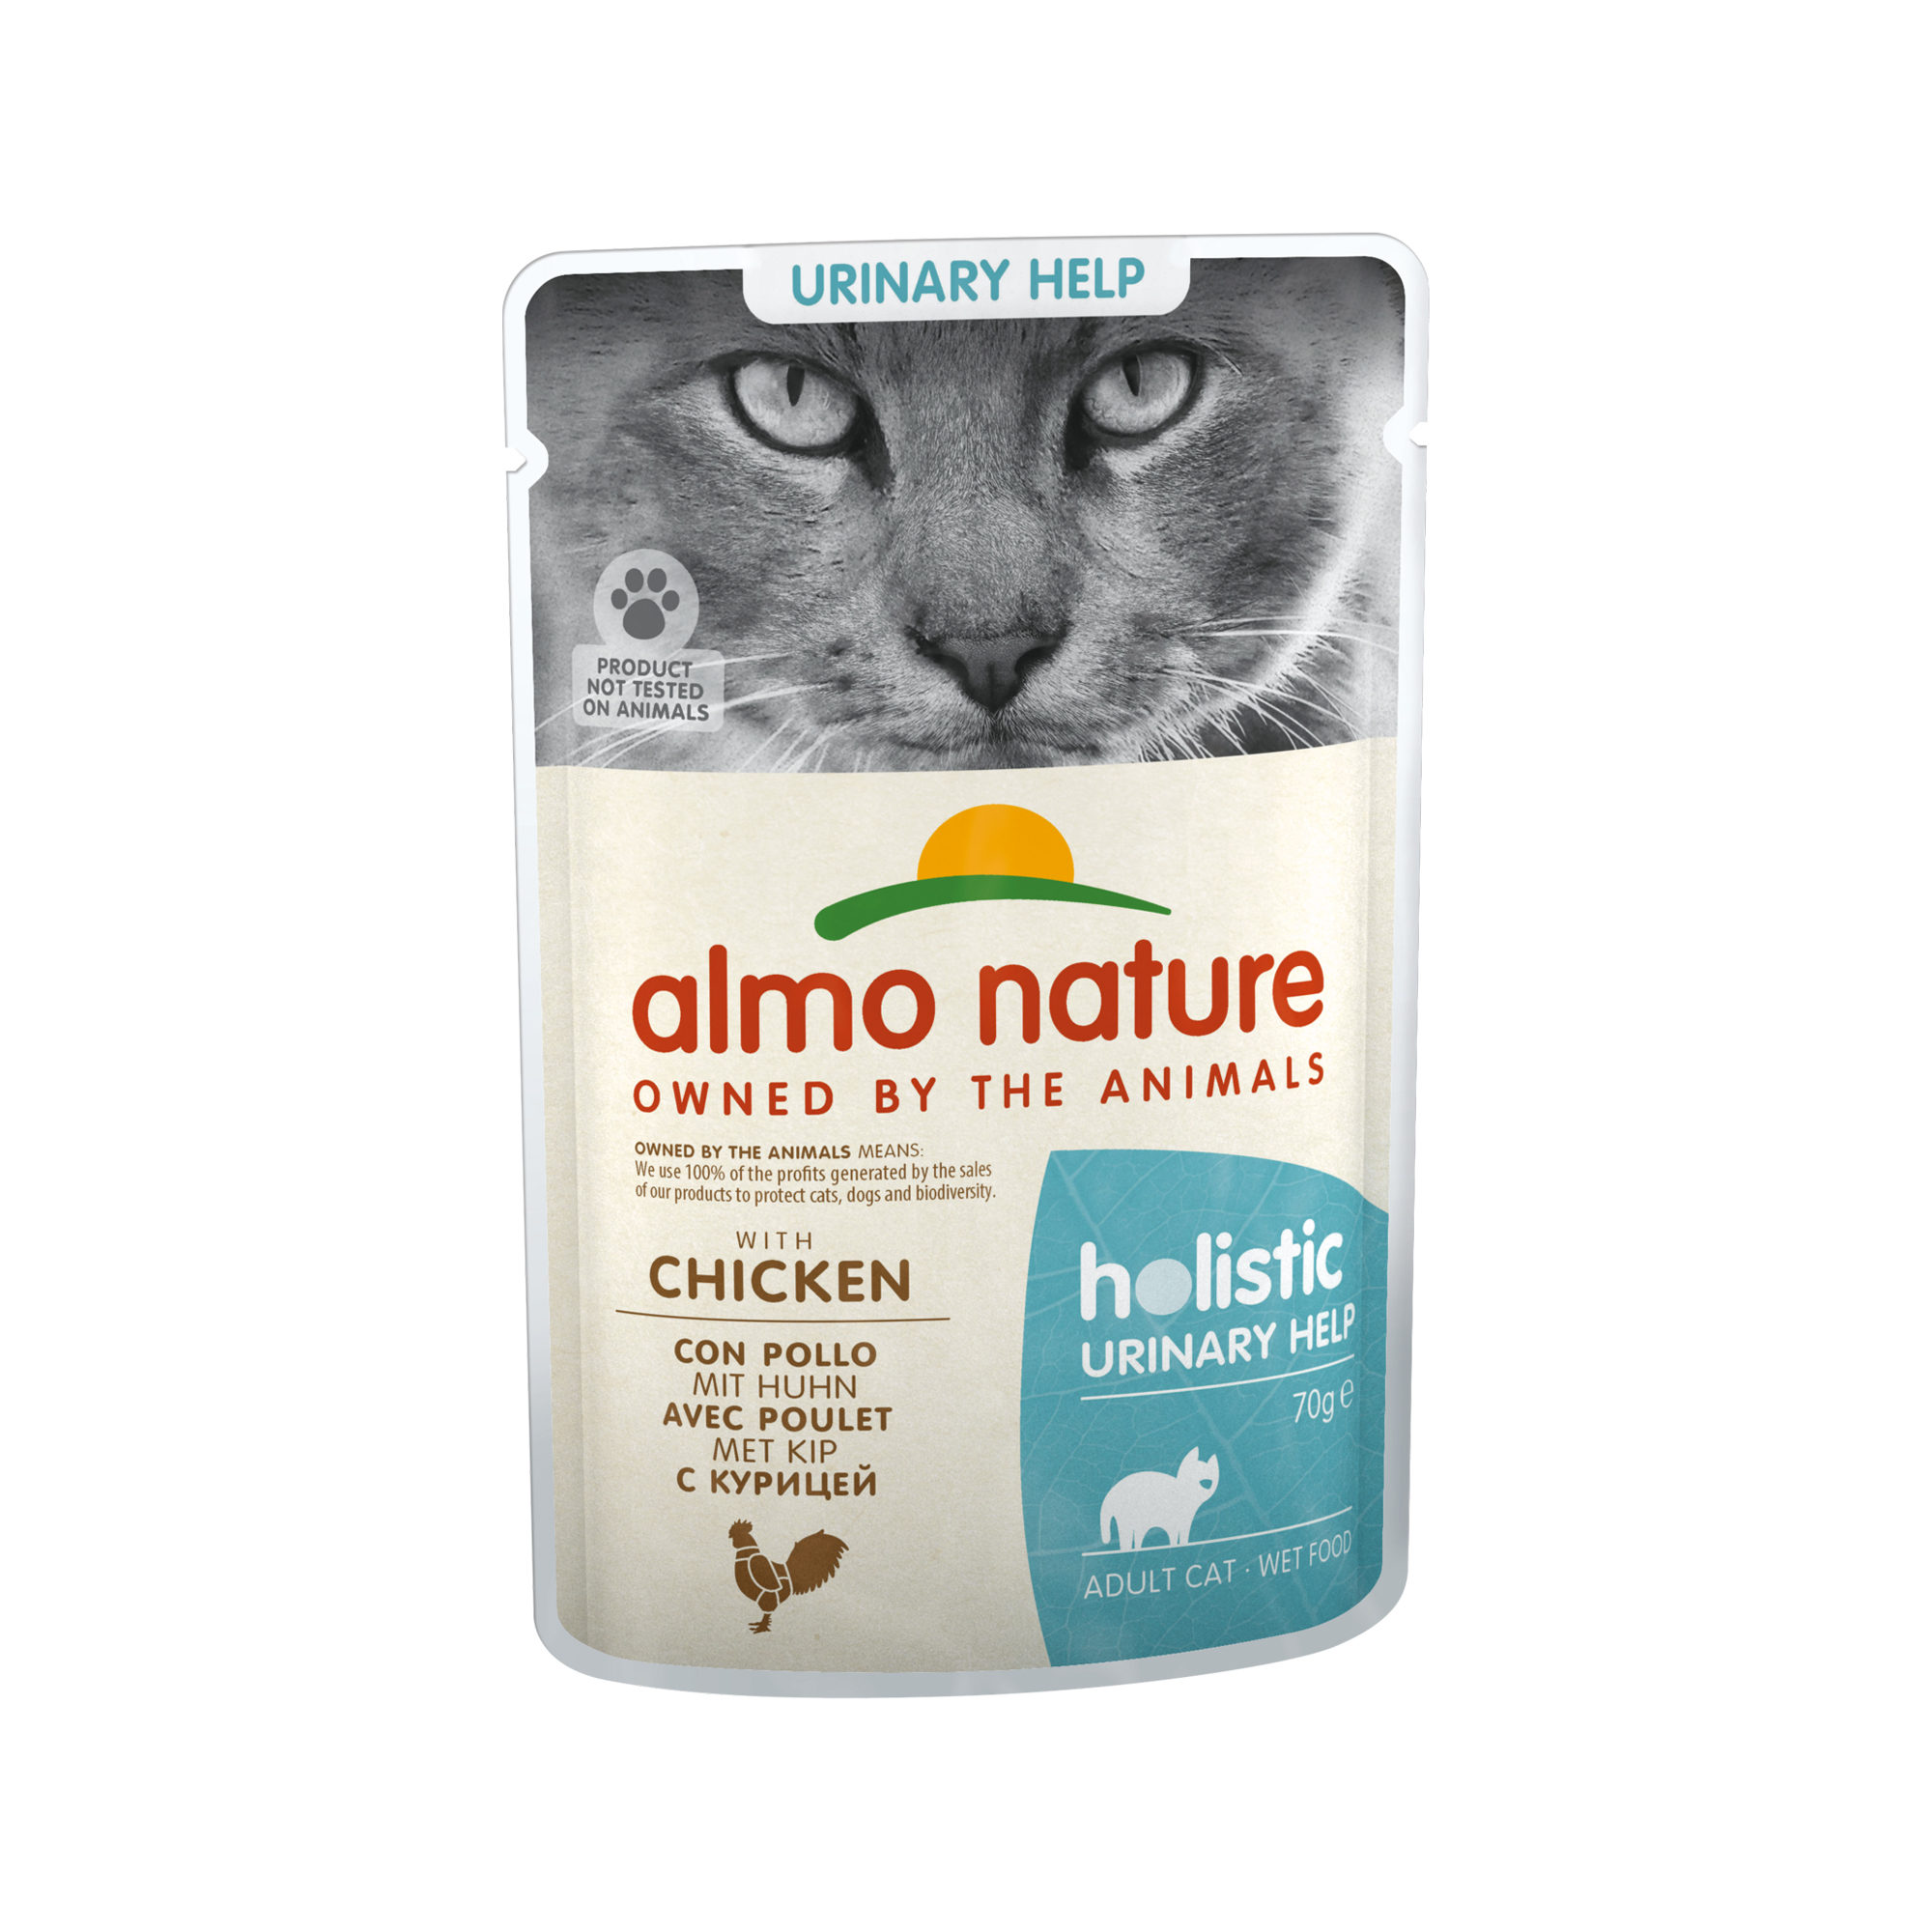 Almo Nature Holistic Urinary Help Katzenfutter - Frischebeutel - Huhn